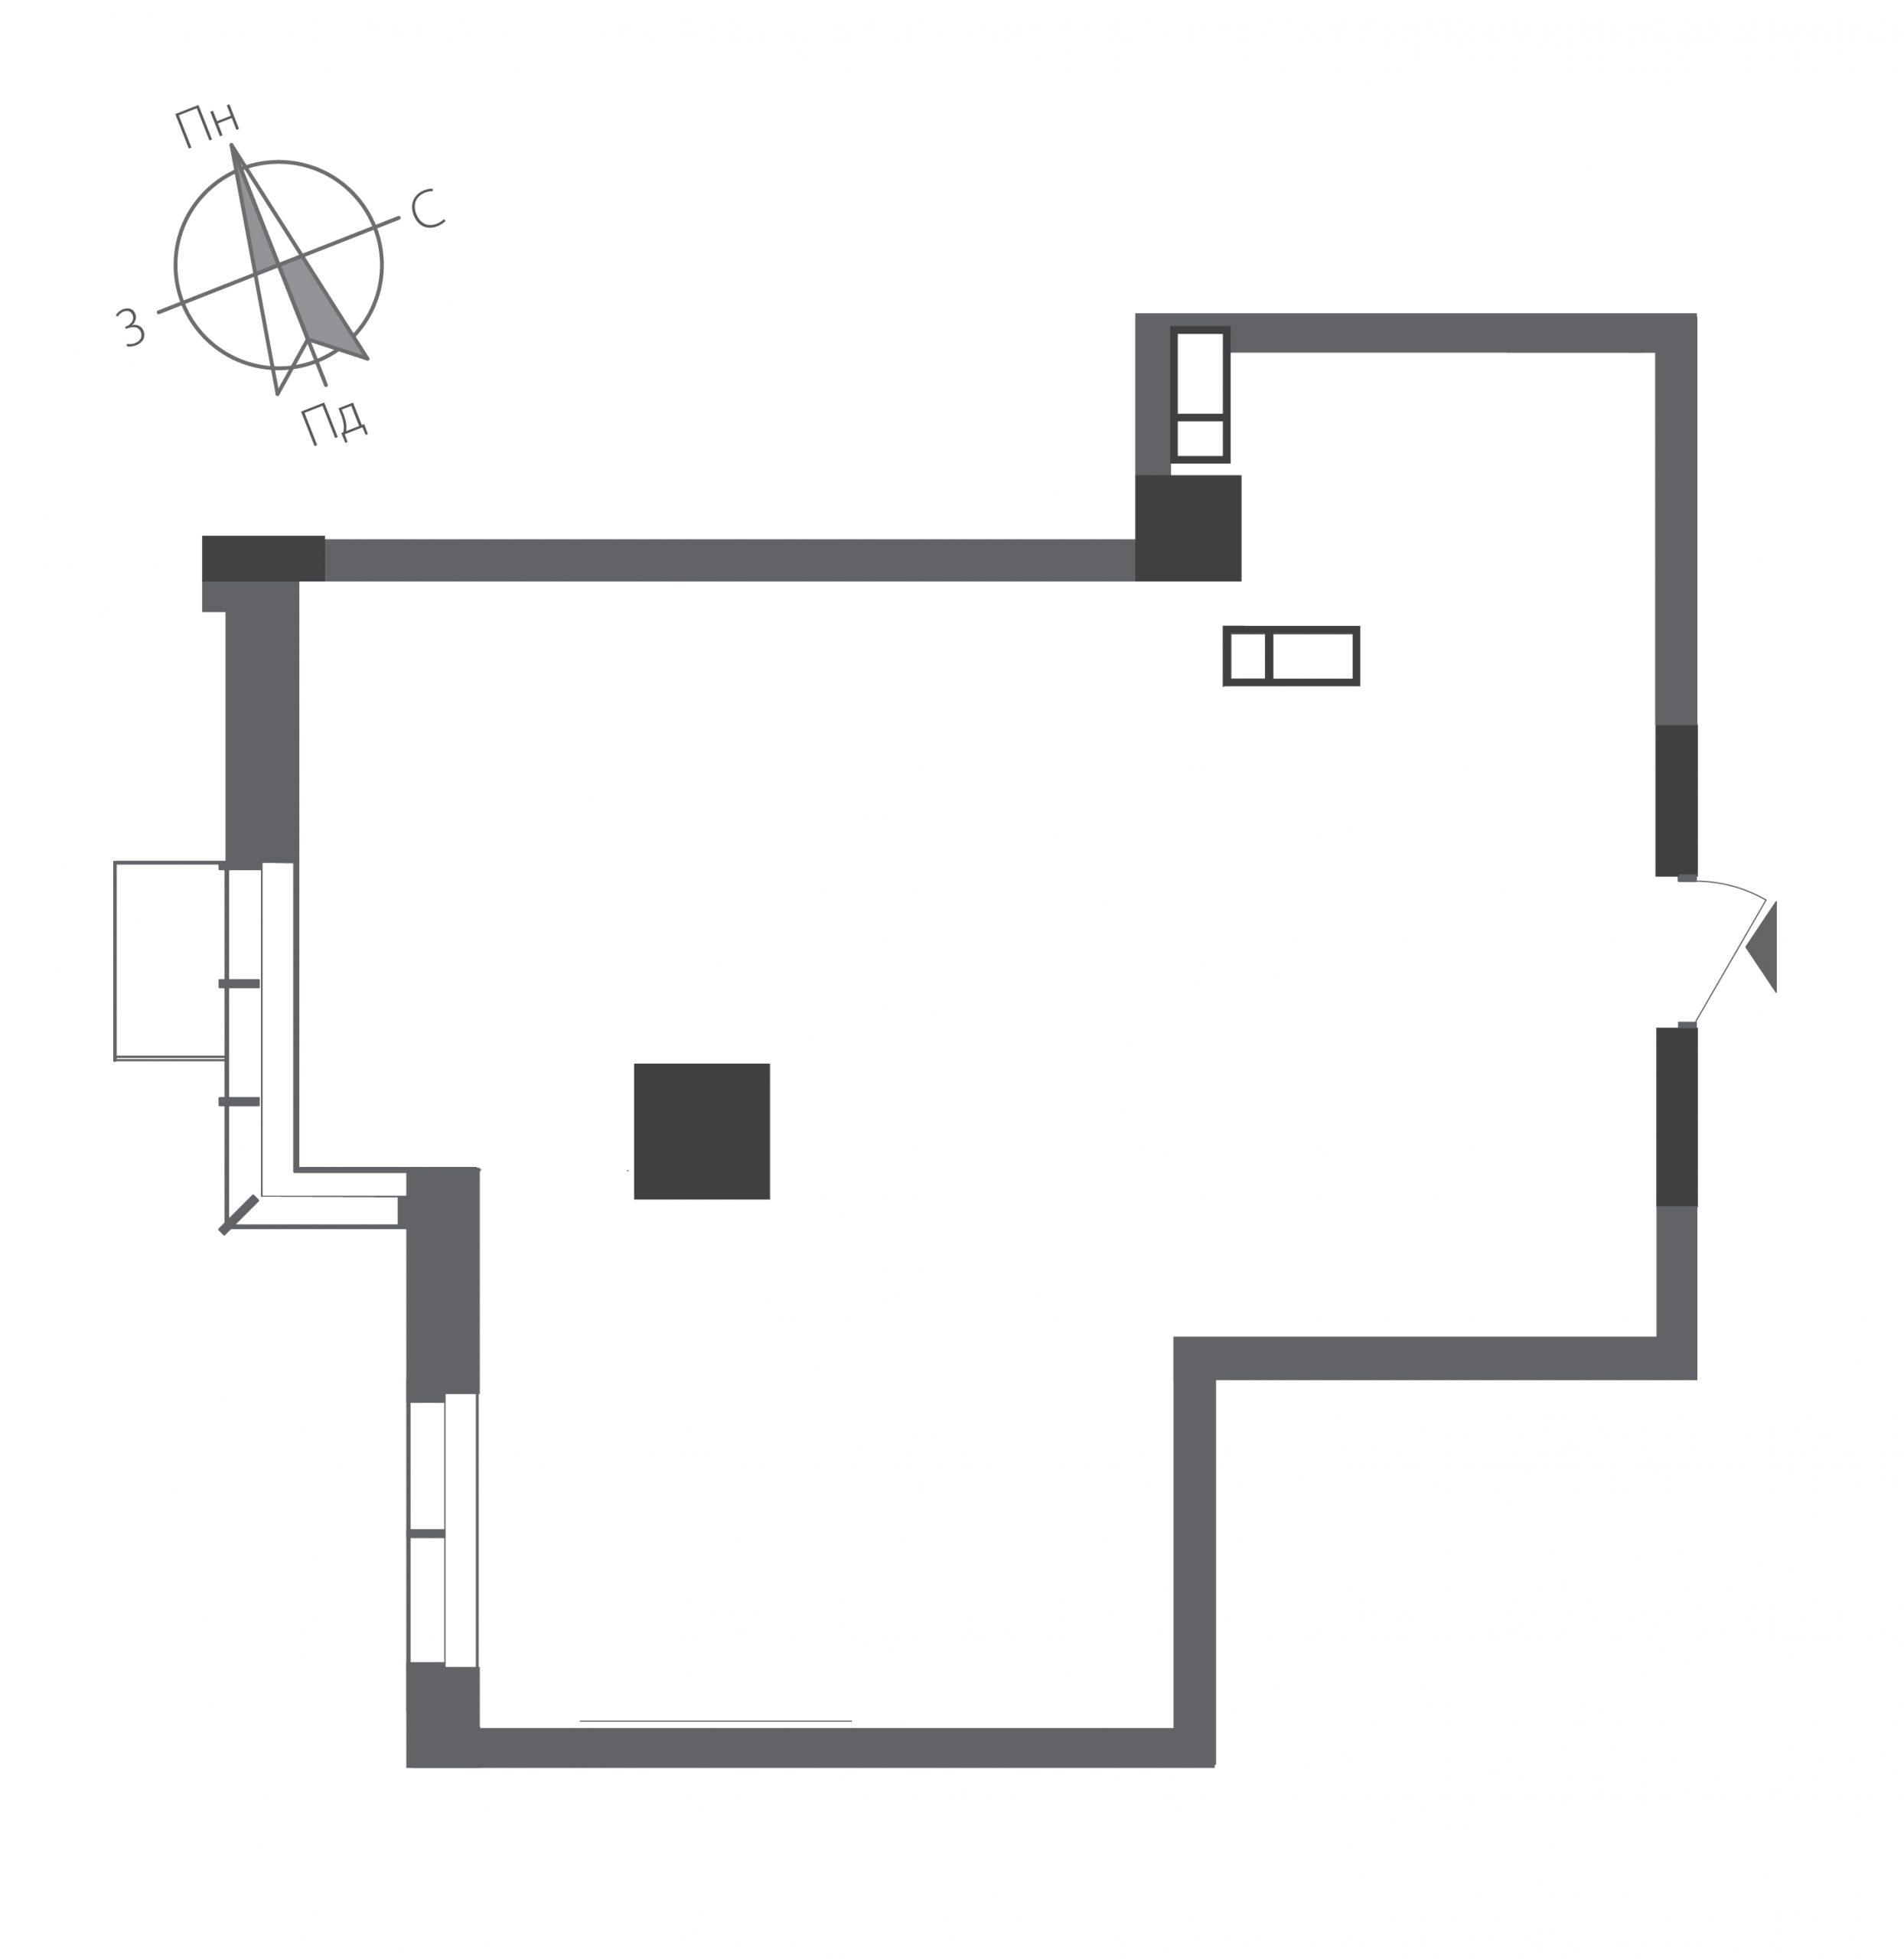 Однокімнатна квартира в ЖК RiverStone Номер квартири №10, Будинок 9, Поверх 10, Повна площа 57,38